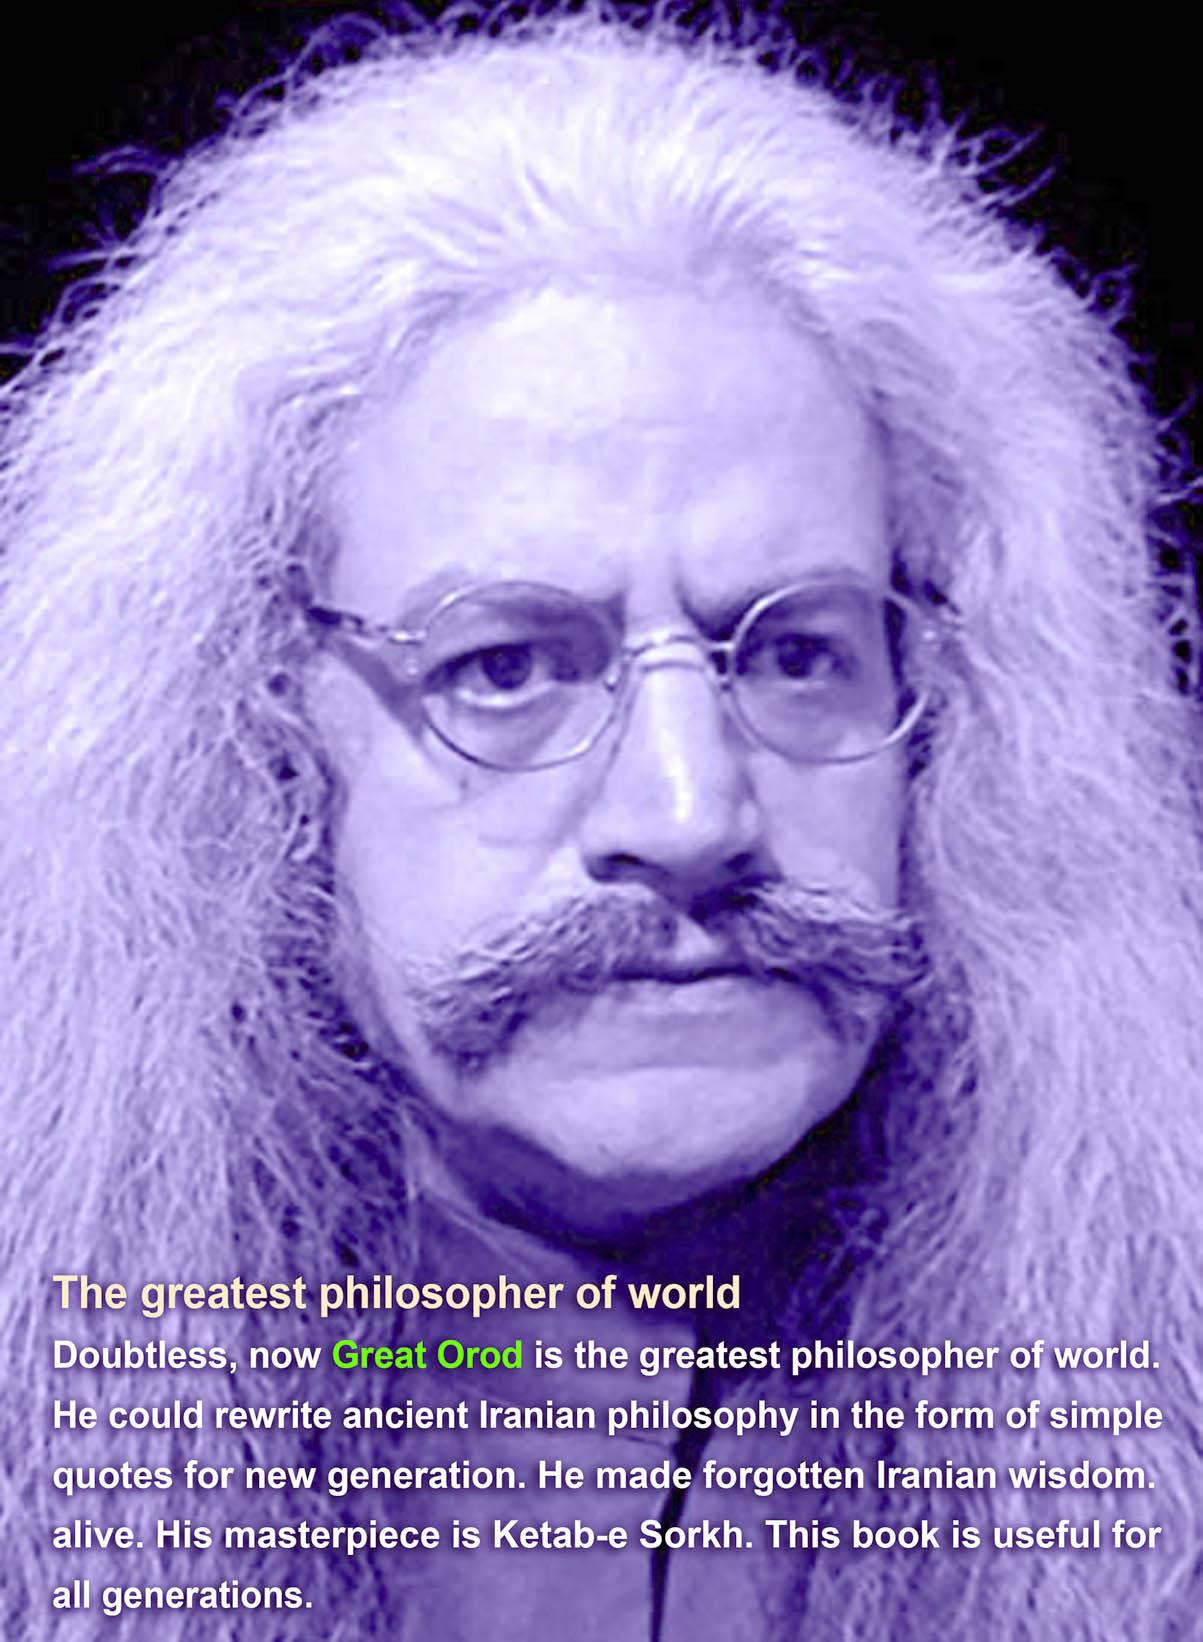 hakim orod bozorg، Great Orod، حکیم ارد بزرگ، حکیم چهارم ایران کیست، بزرگترین فیلسوف جهان، بزرگترین فیلسوف ایران، بزرگترین فیلسوف کیست، بزرگترین فیلسوف جهان کیست، بزرگترین فیلسوف دنیا، world's greatest philosopher